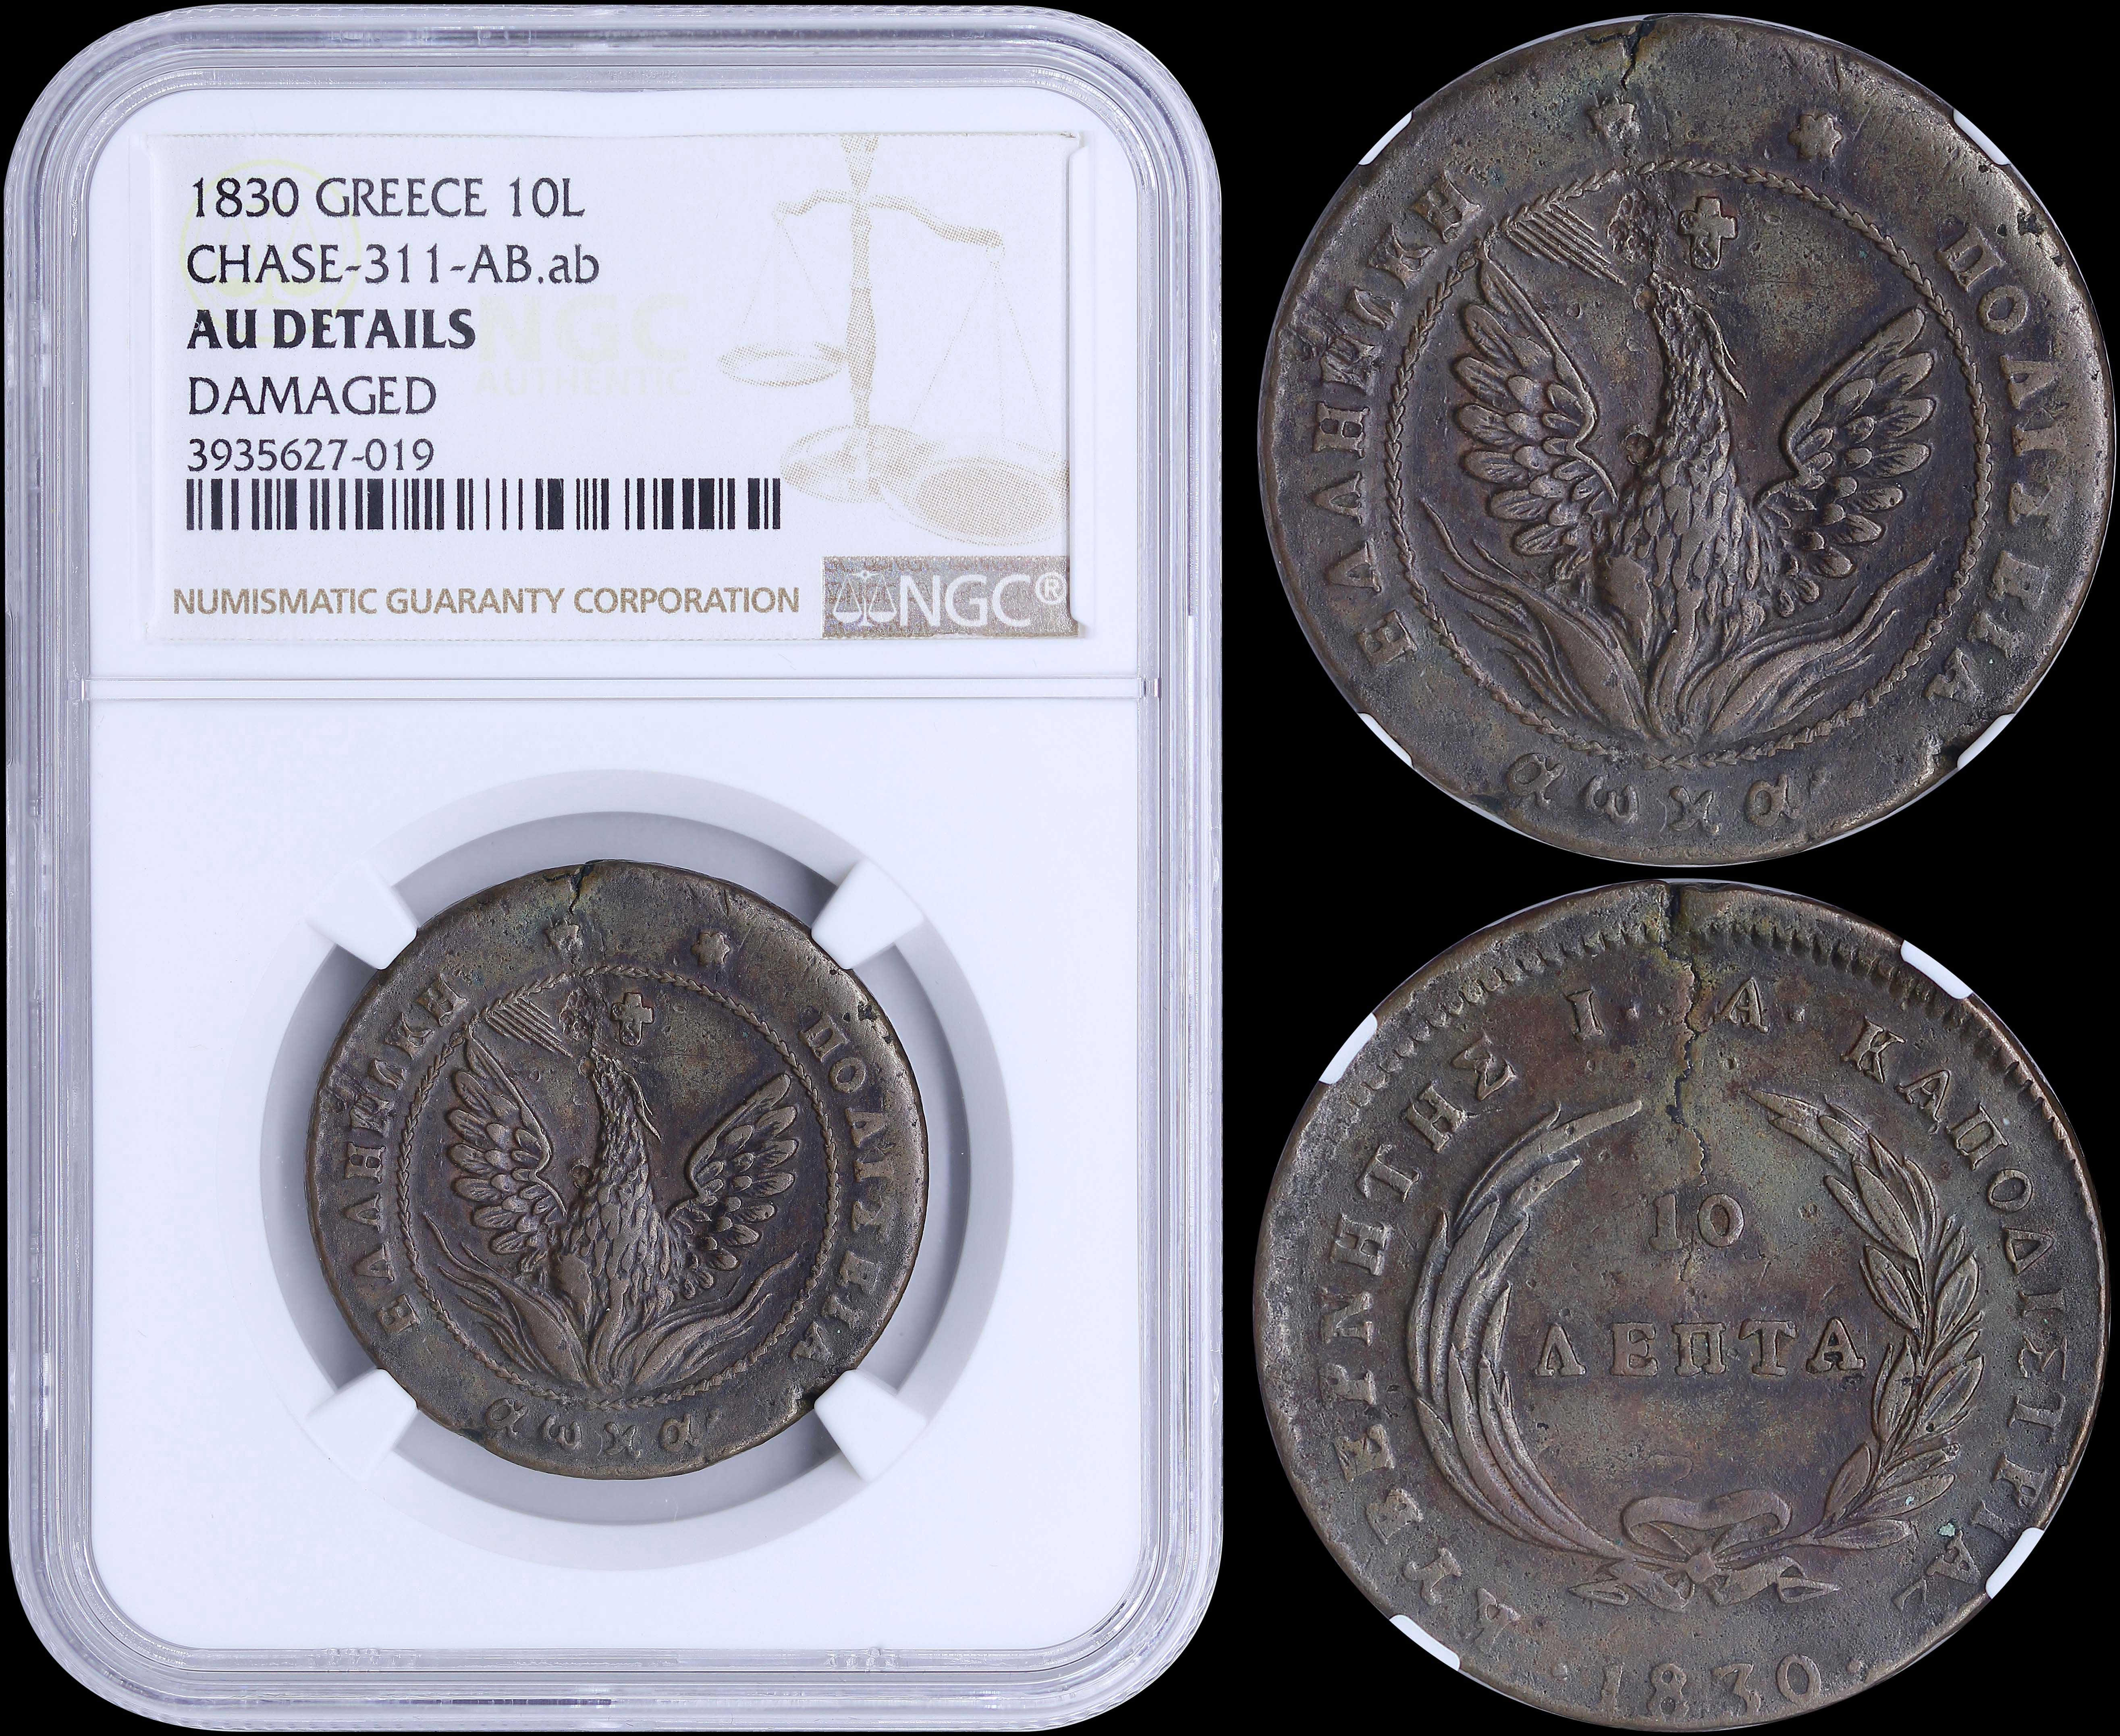 Lot 6018 - -  COINS & TOKENS governor capodistrias -  A. Karamitsos Public & Live Internet Auction 682 (Part A) Coins, Medals & Banknotes